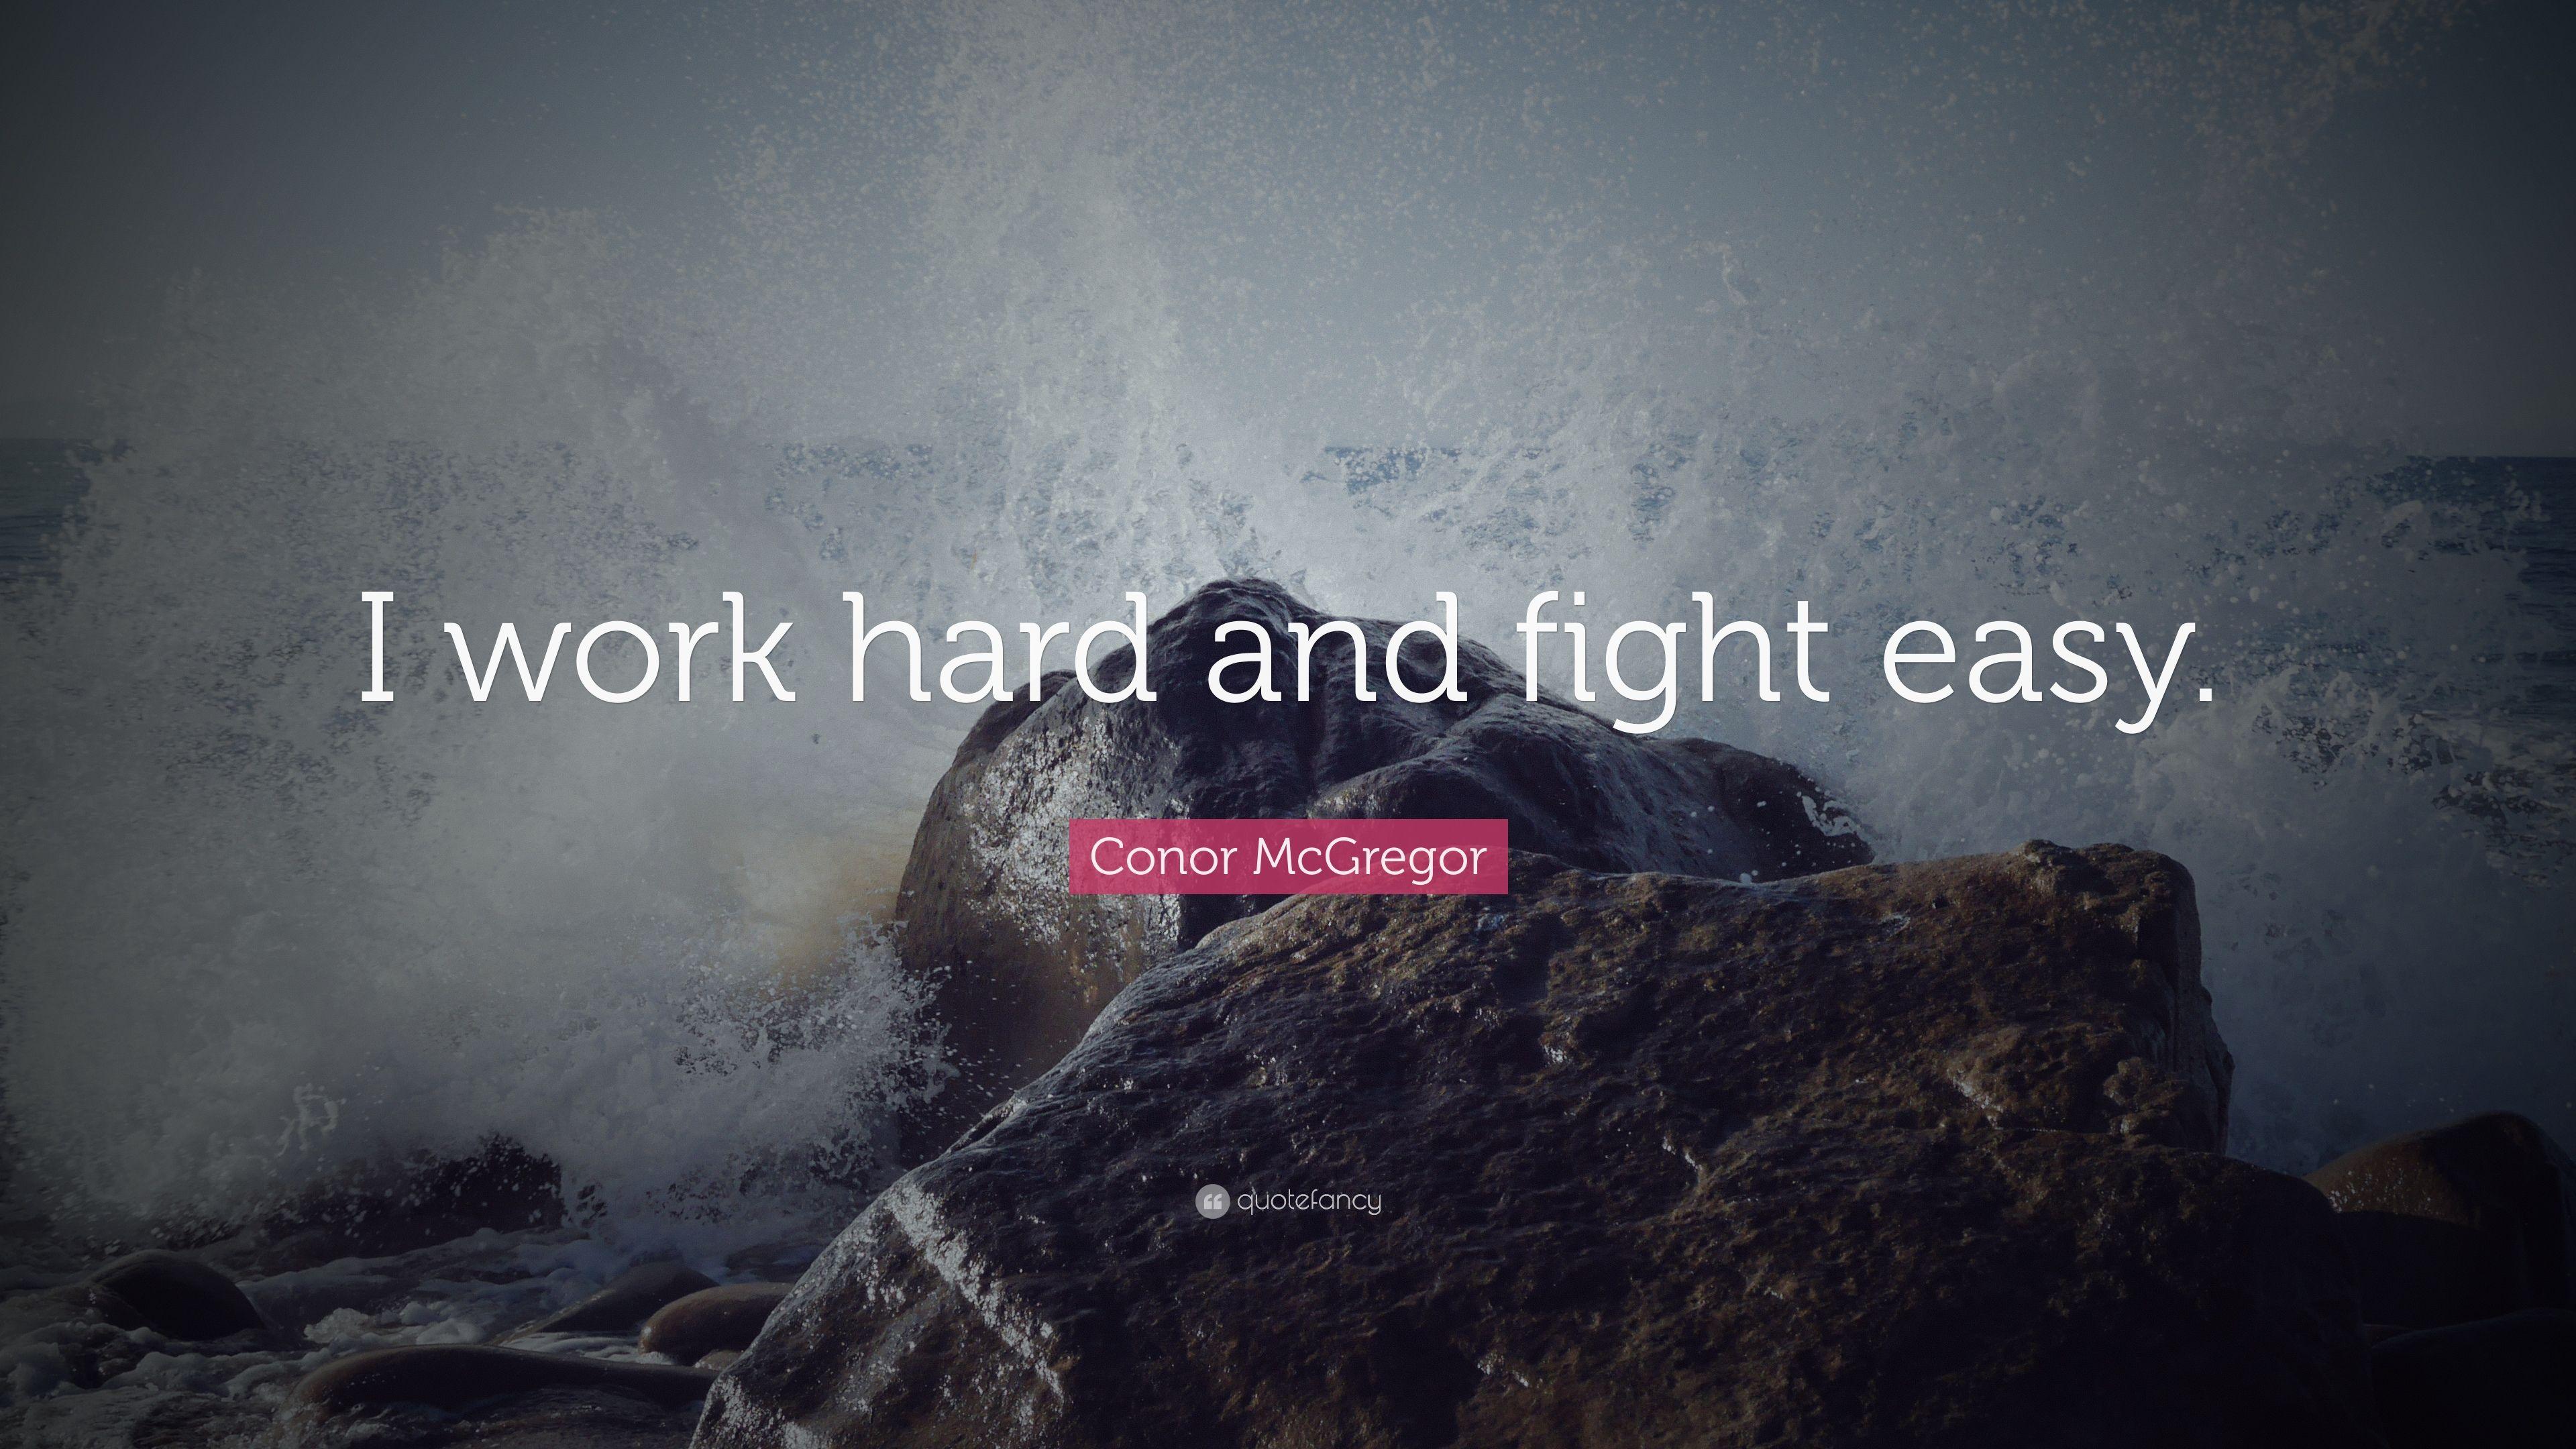 Conor Mcgregor Wallpapers Images Desktop Wallpaper Box Jim Rohn Quotes Roosevelt Quotes Best Inspirational Quotes